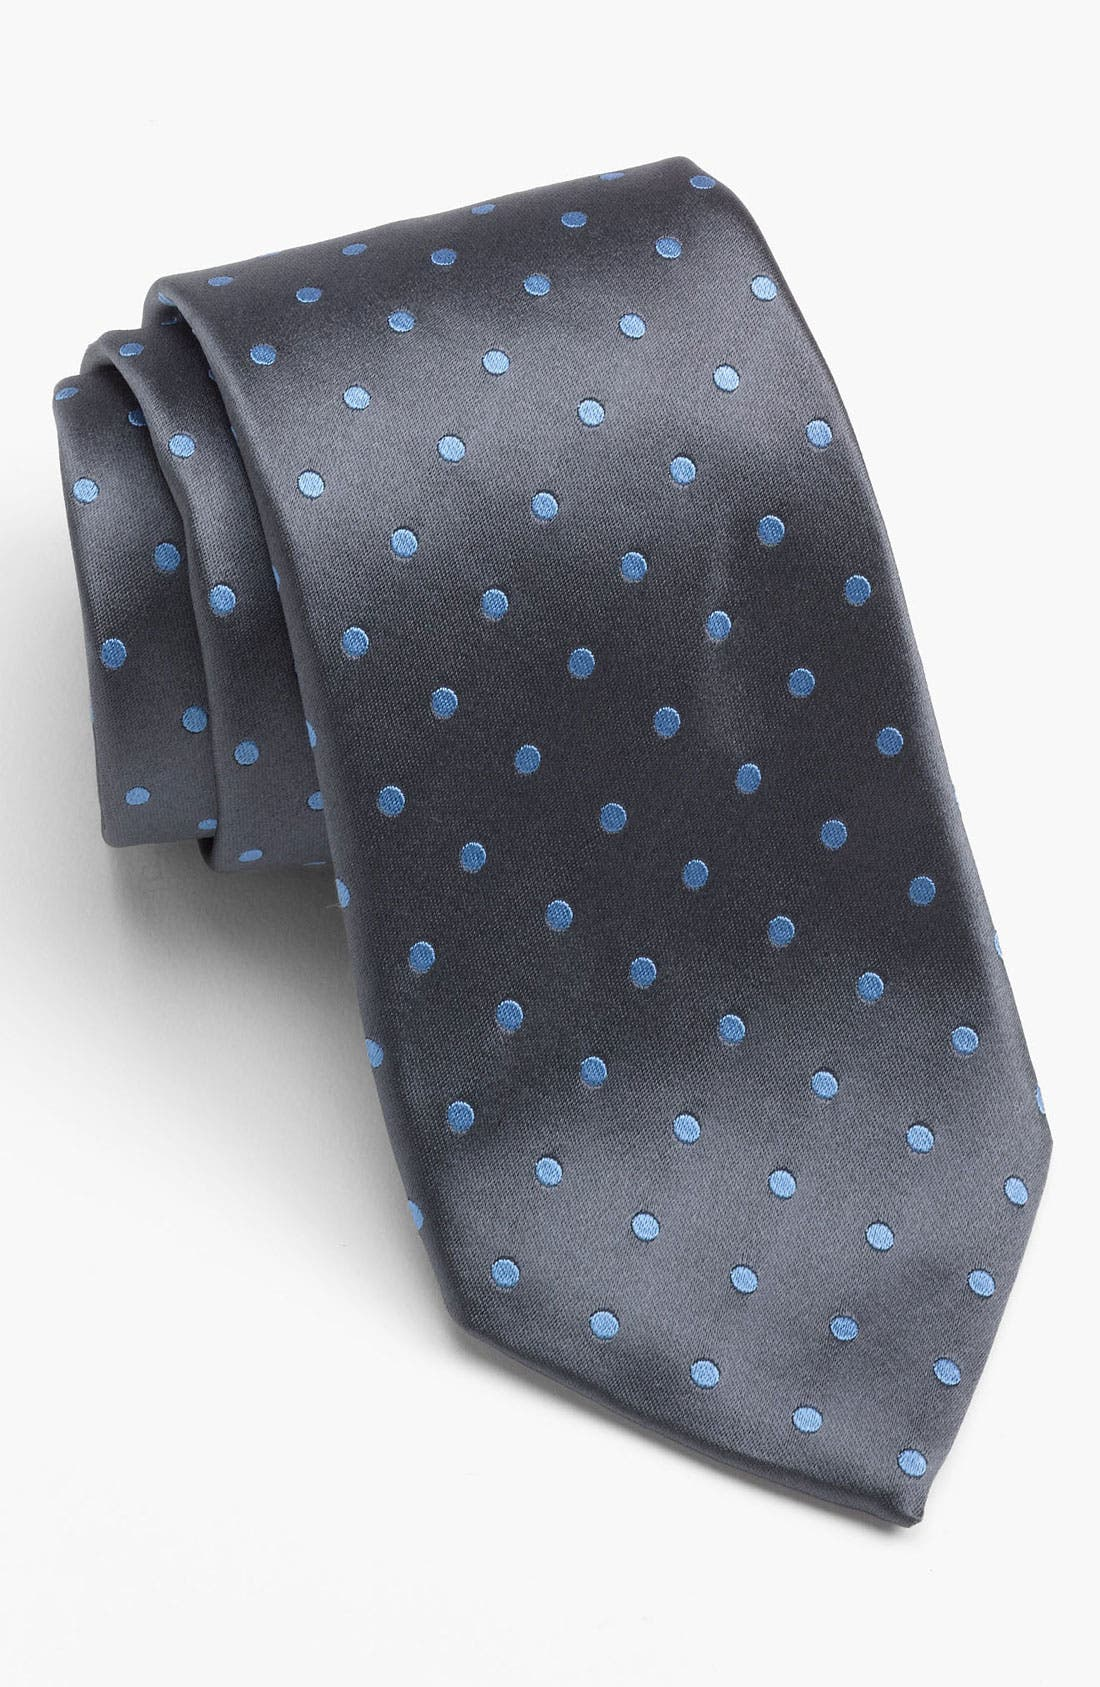 Alternate Image 1 Selected - David Donahue Dress Shirt & Tie